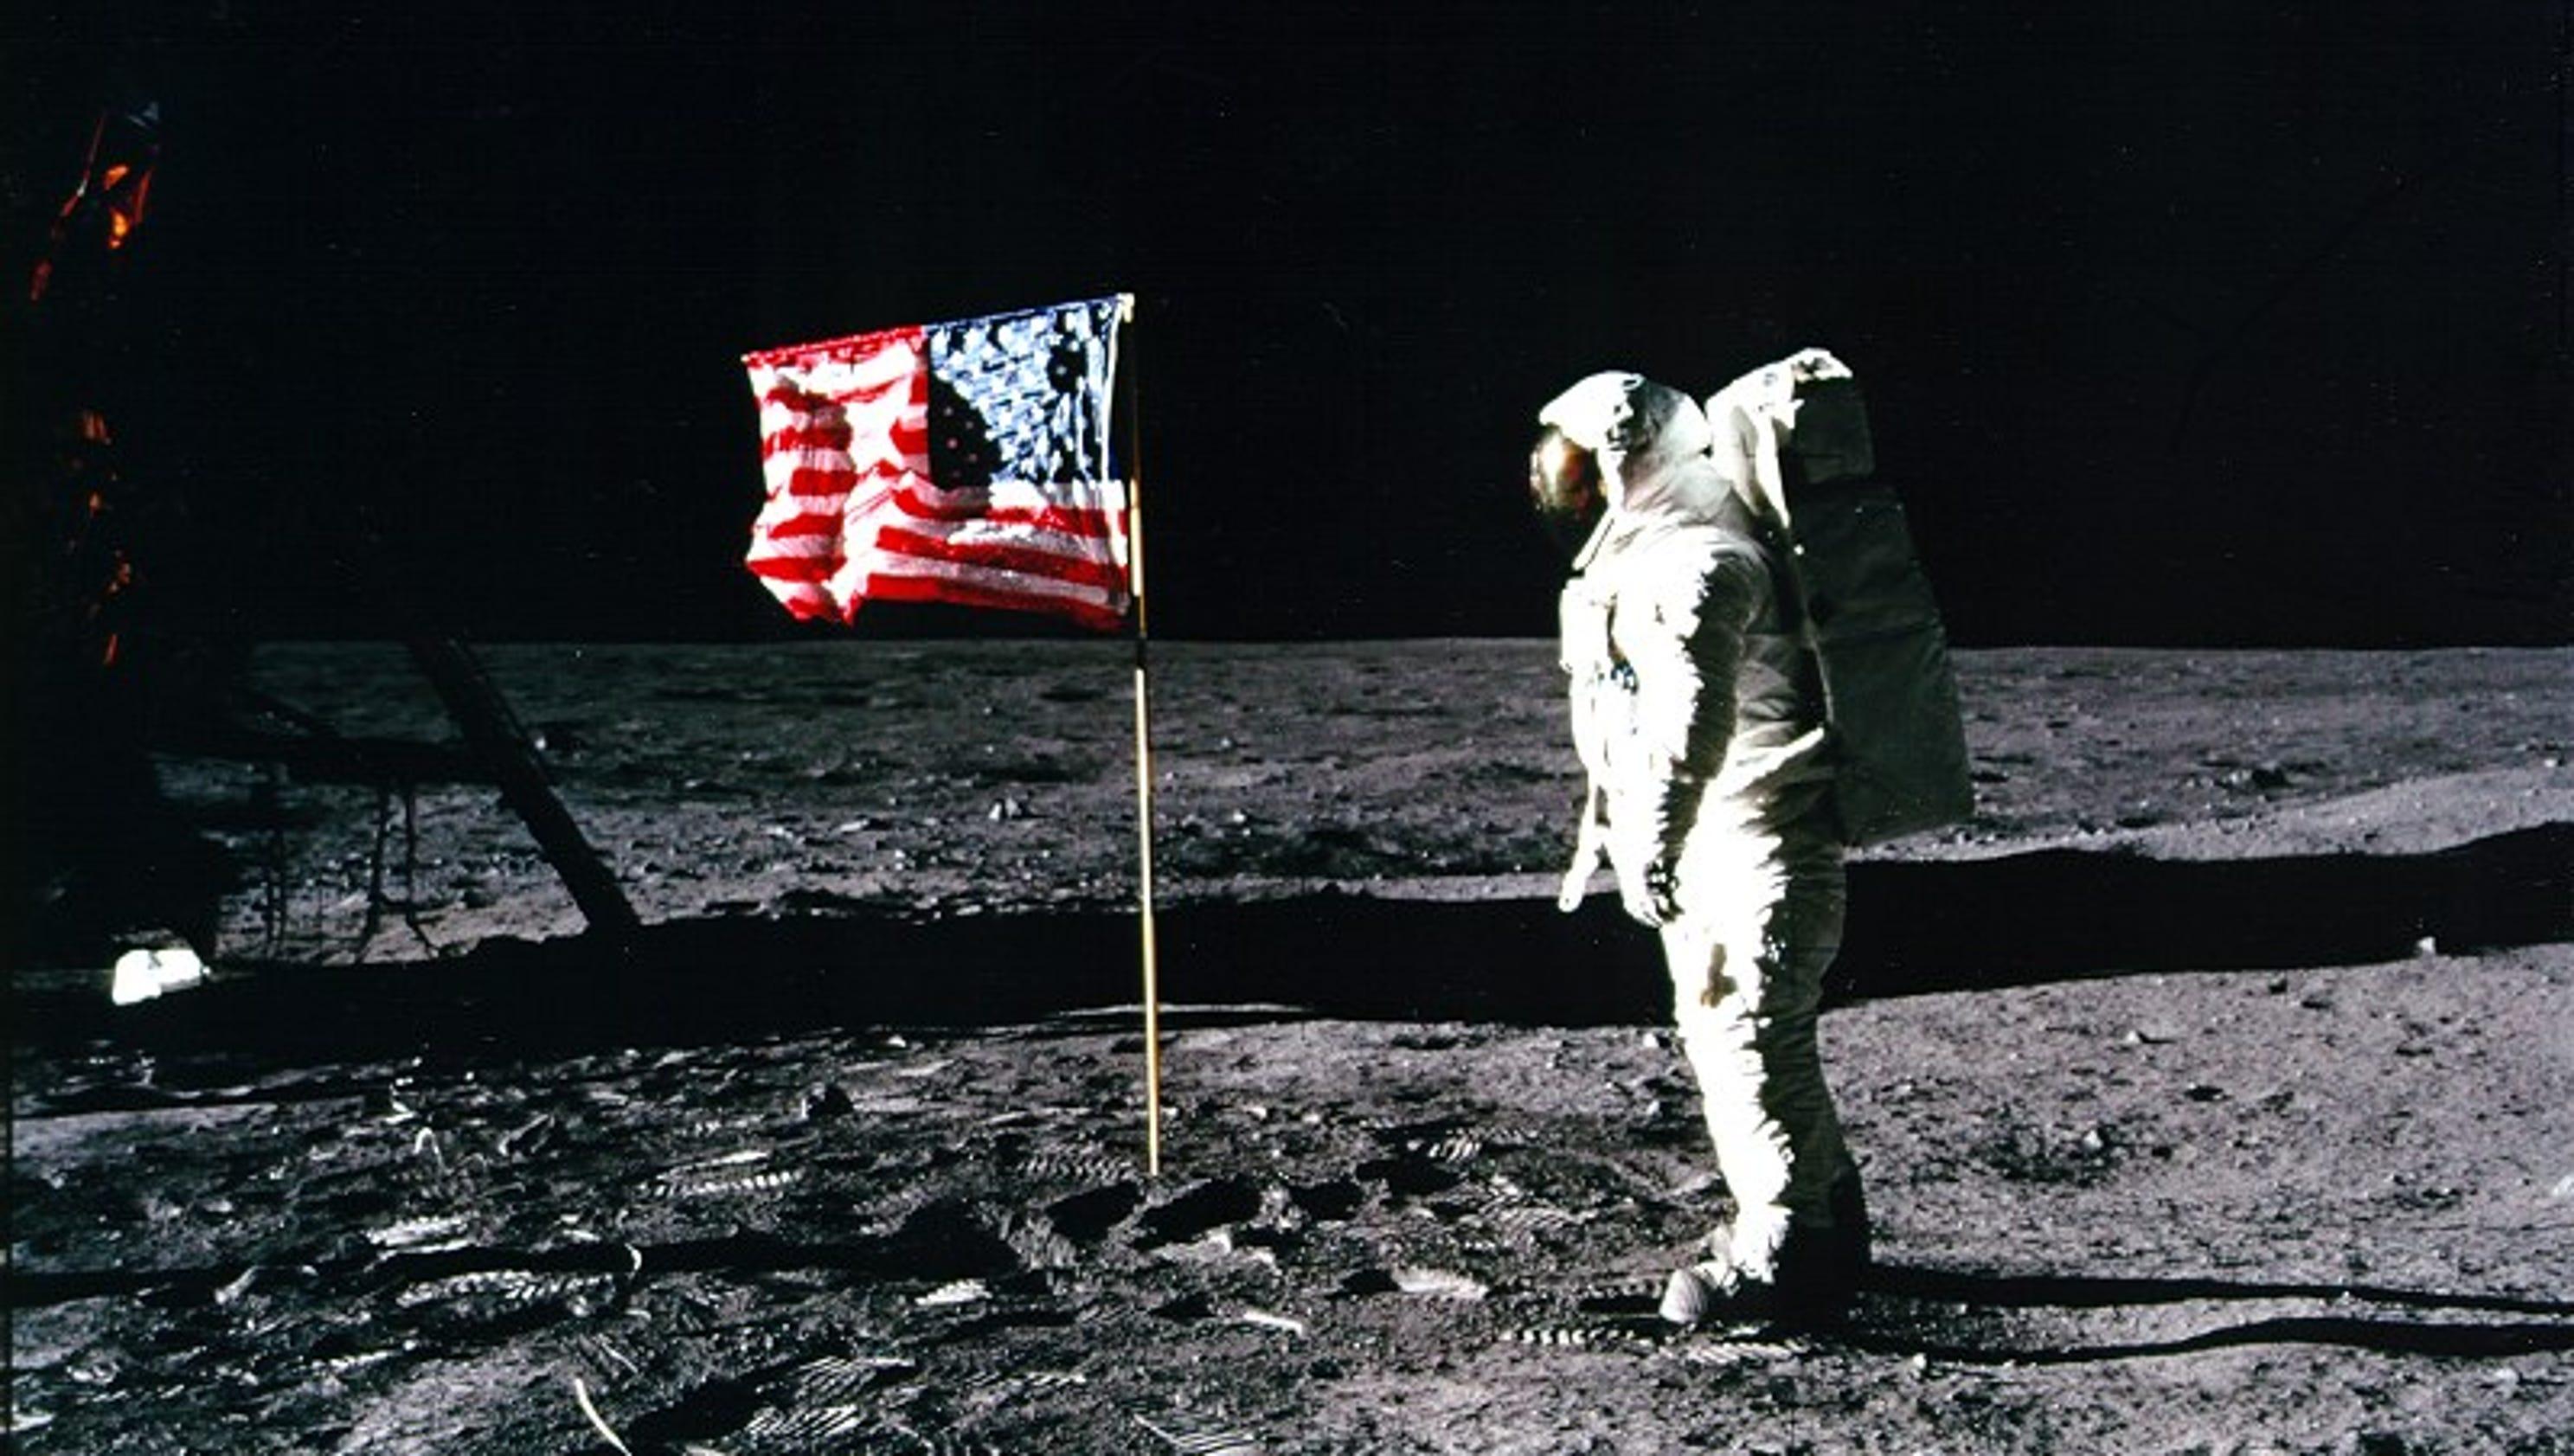 The Apollo 11 moon landing anniversary